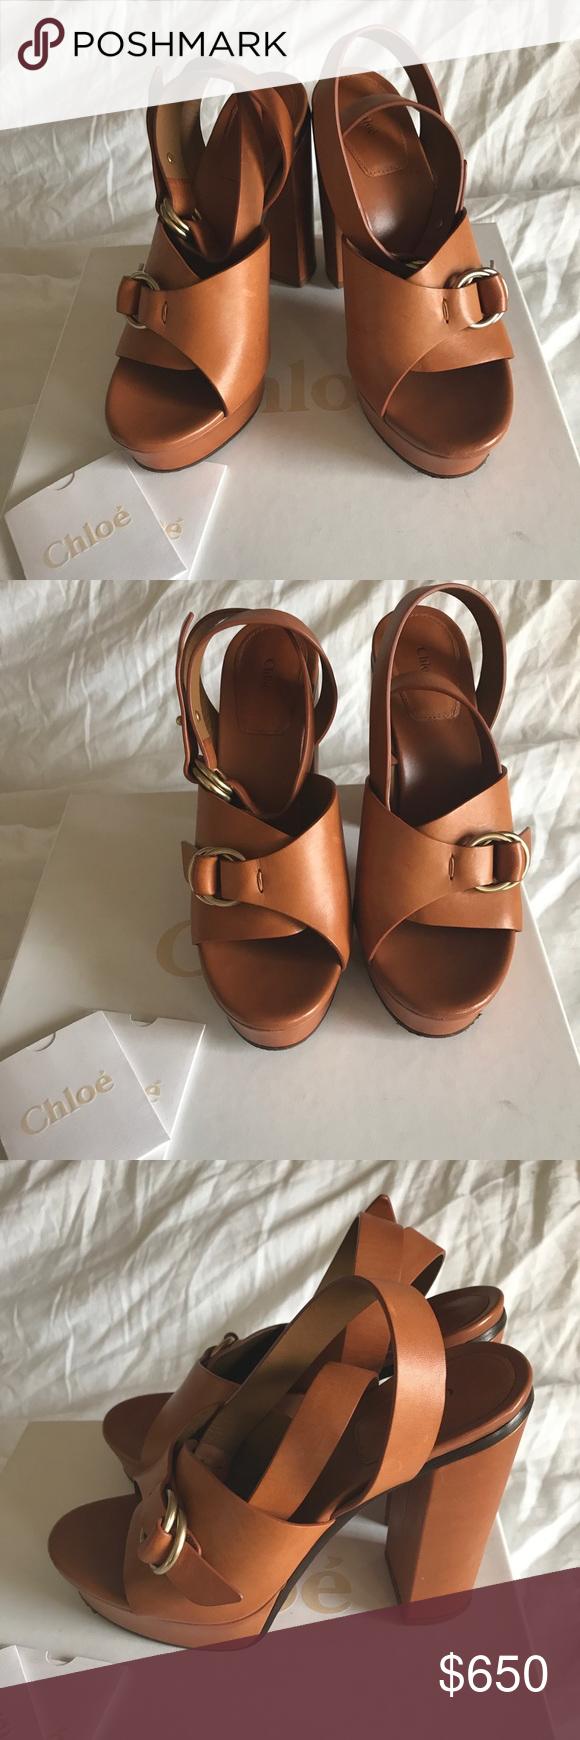 8b1accd0dab Chloe Kingsley Platform Buckle Sandal Chloe matte leather sandal. 5